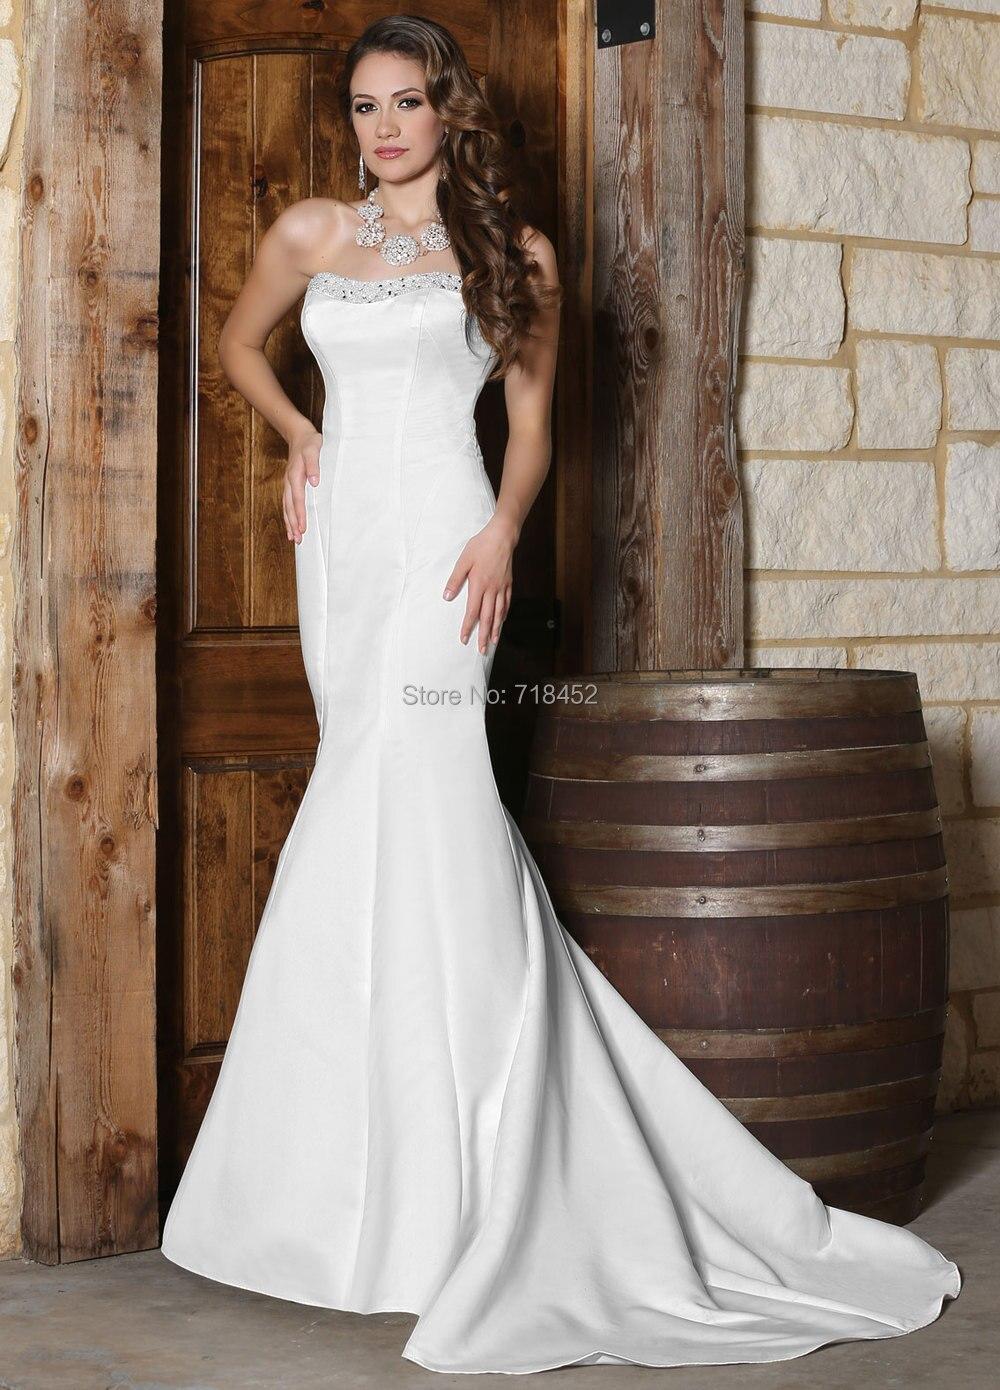 Aliexpress.com : Buy New Fashion Classic Wedding Dress Mermaid ...